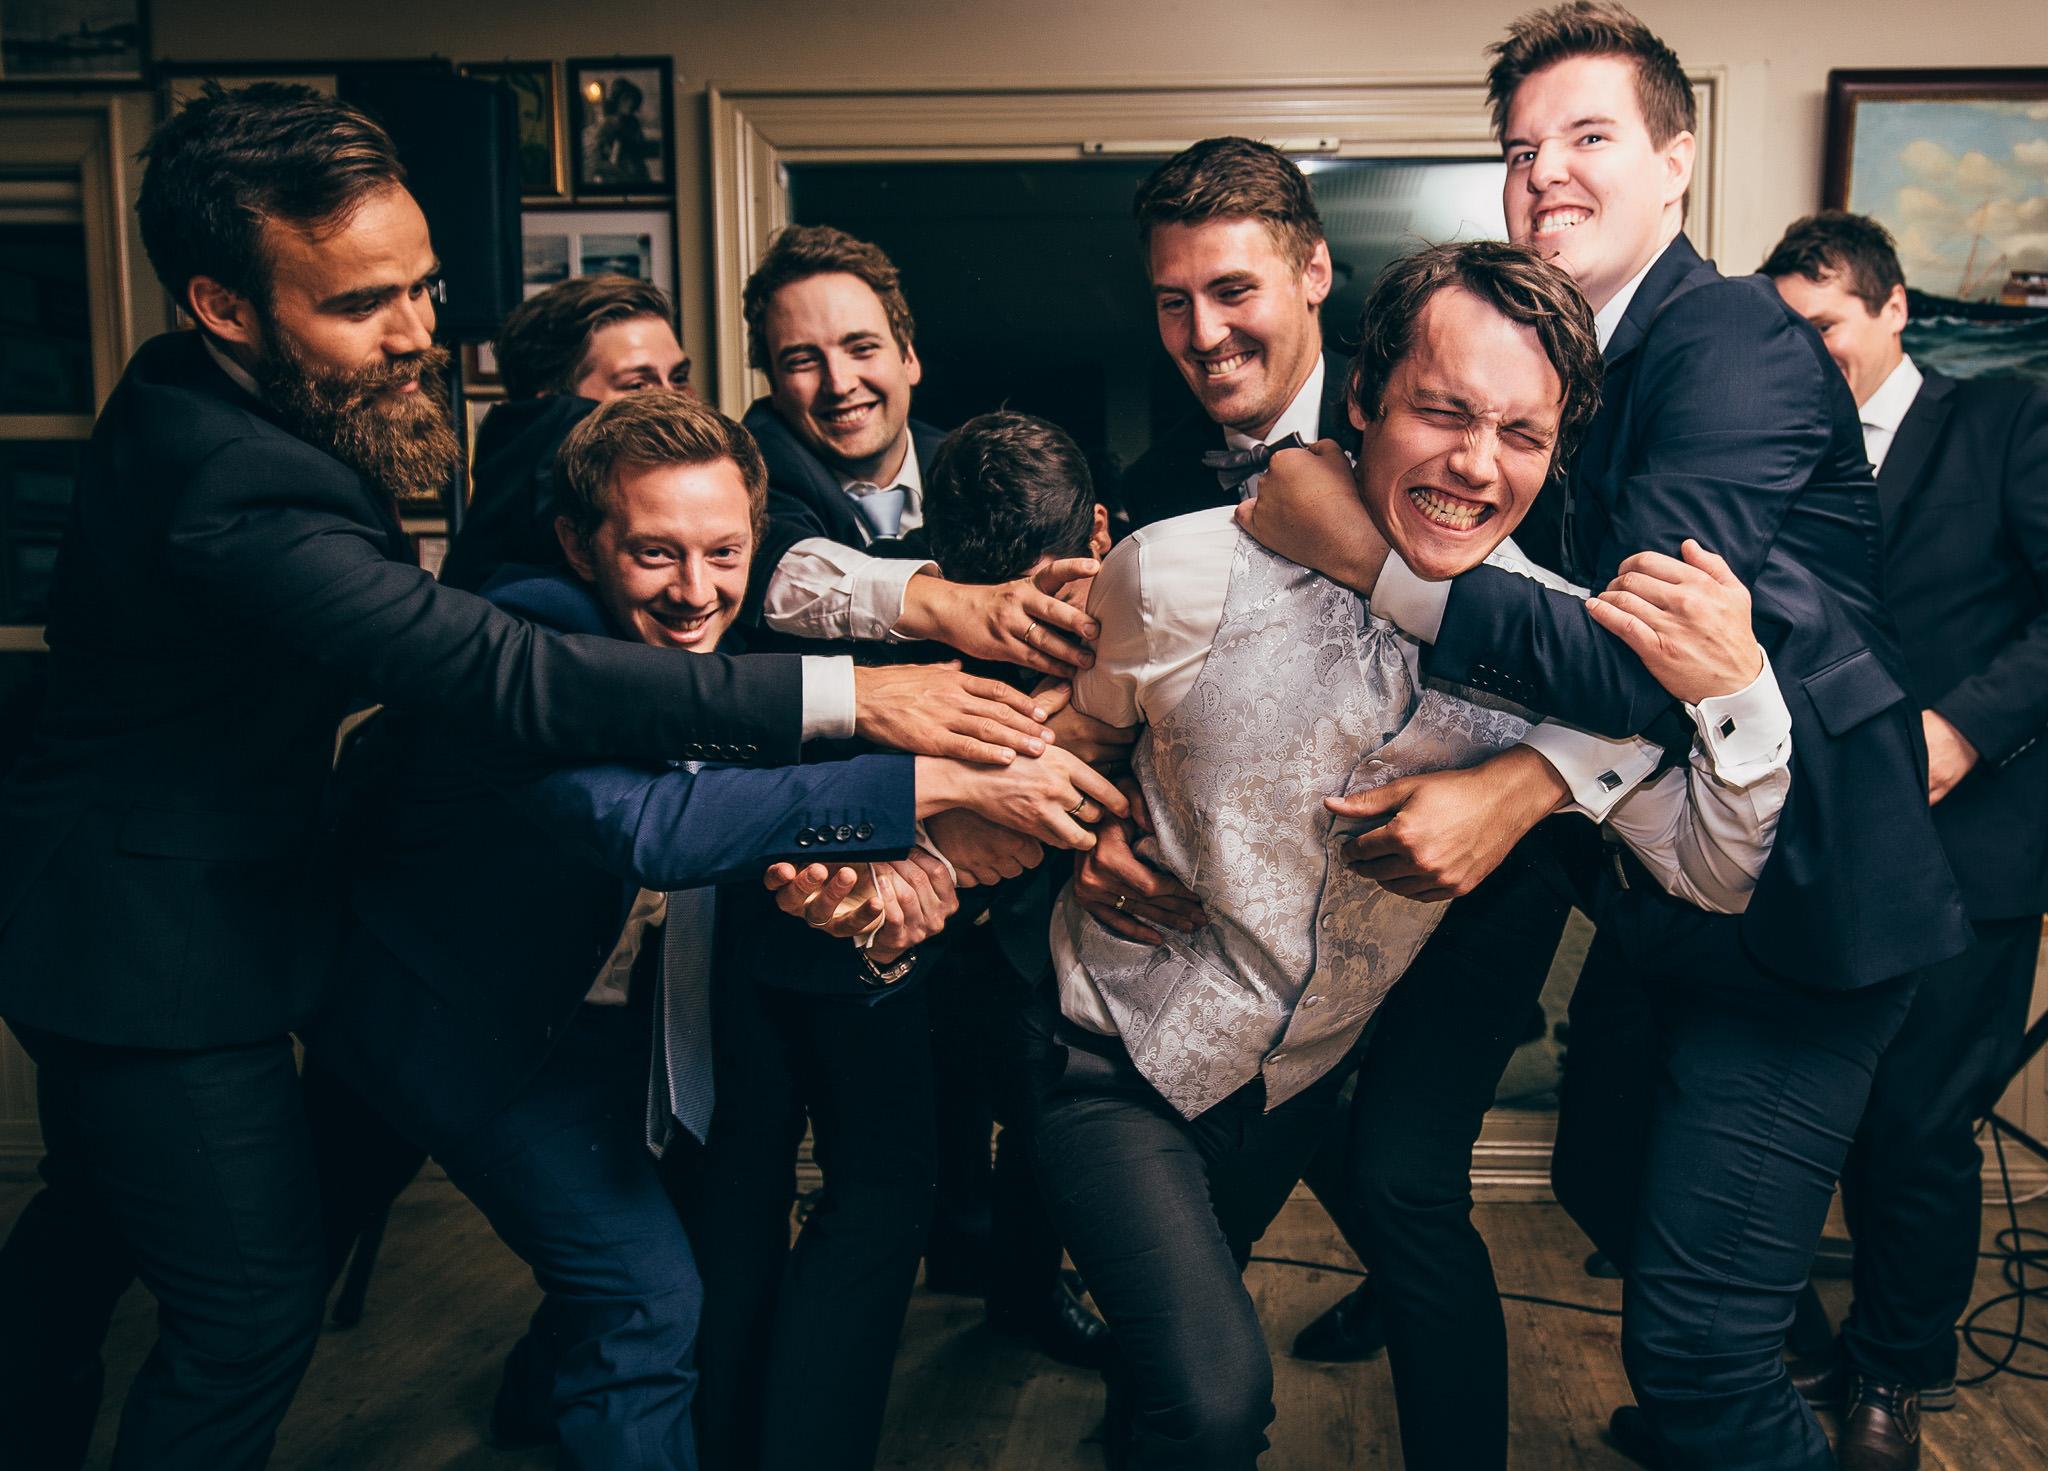 Wedding+Photographer+Norway+Bryllupsfotograf+Casey+Arneson+JT-201.jpg